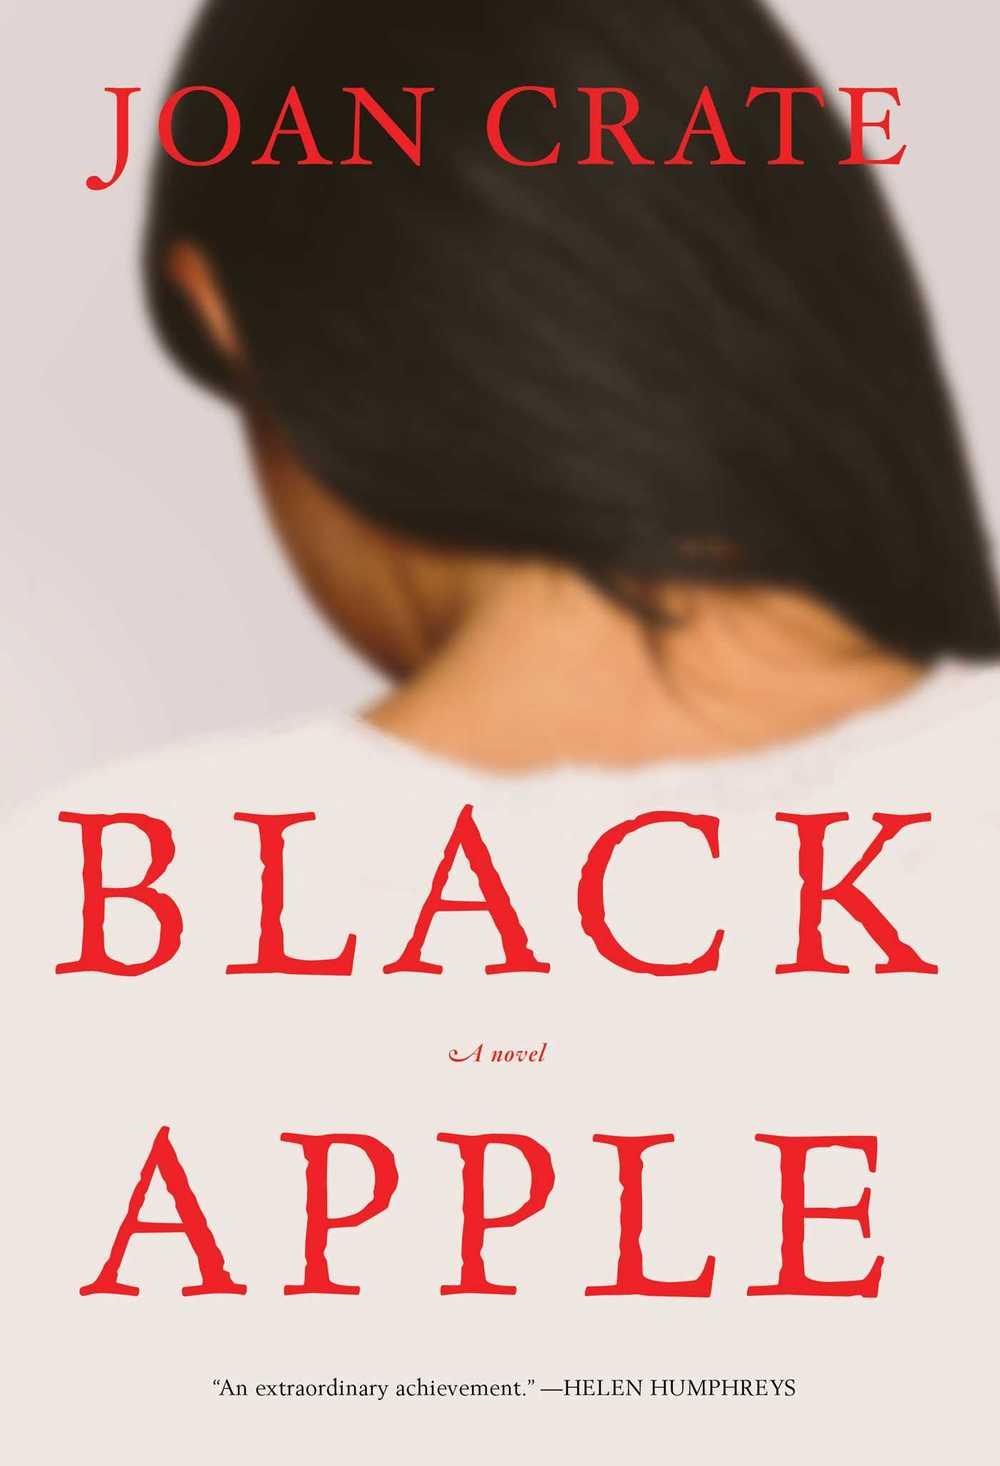 Black Apple, by Joan Crate